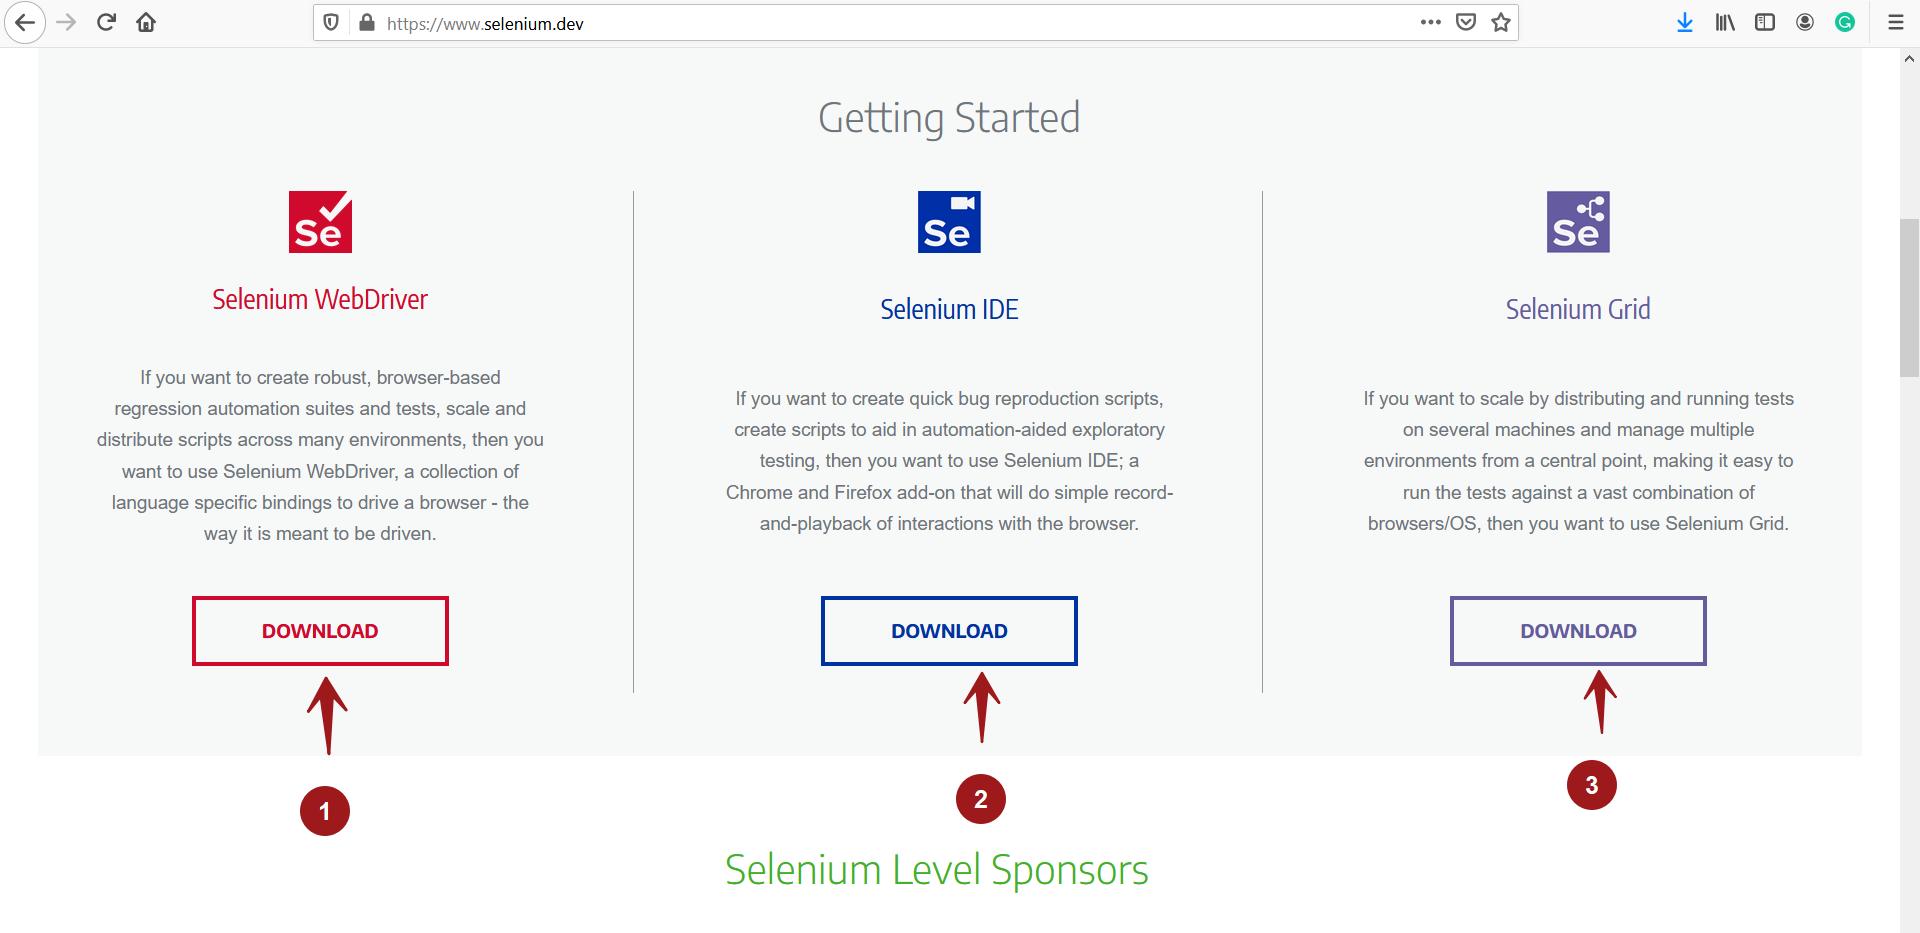 Selenium WebDriver Download